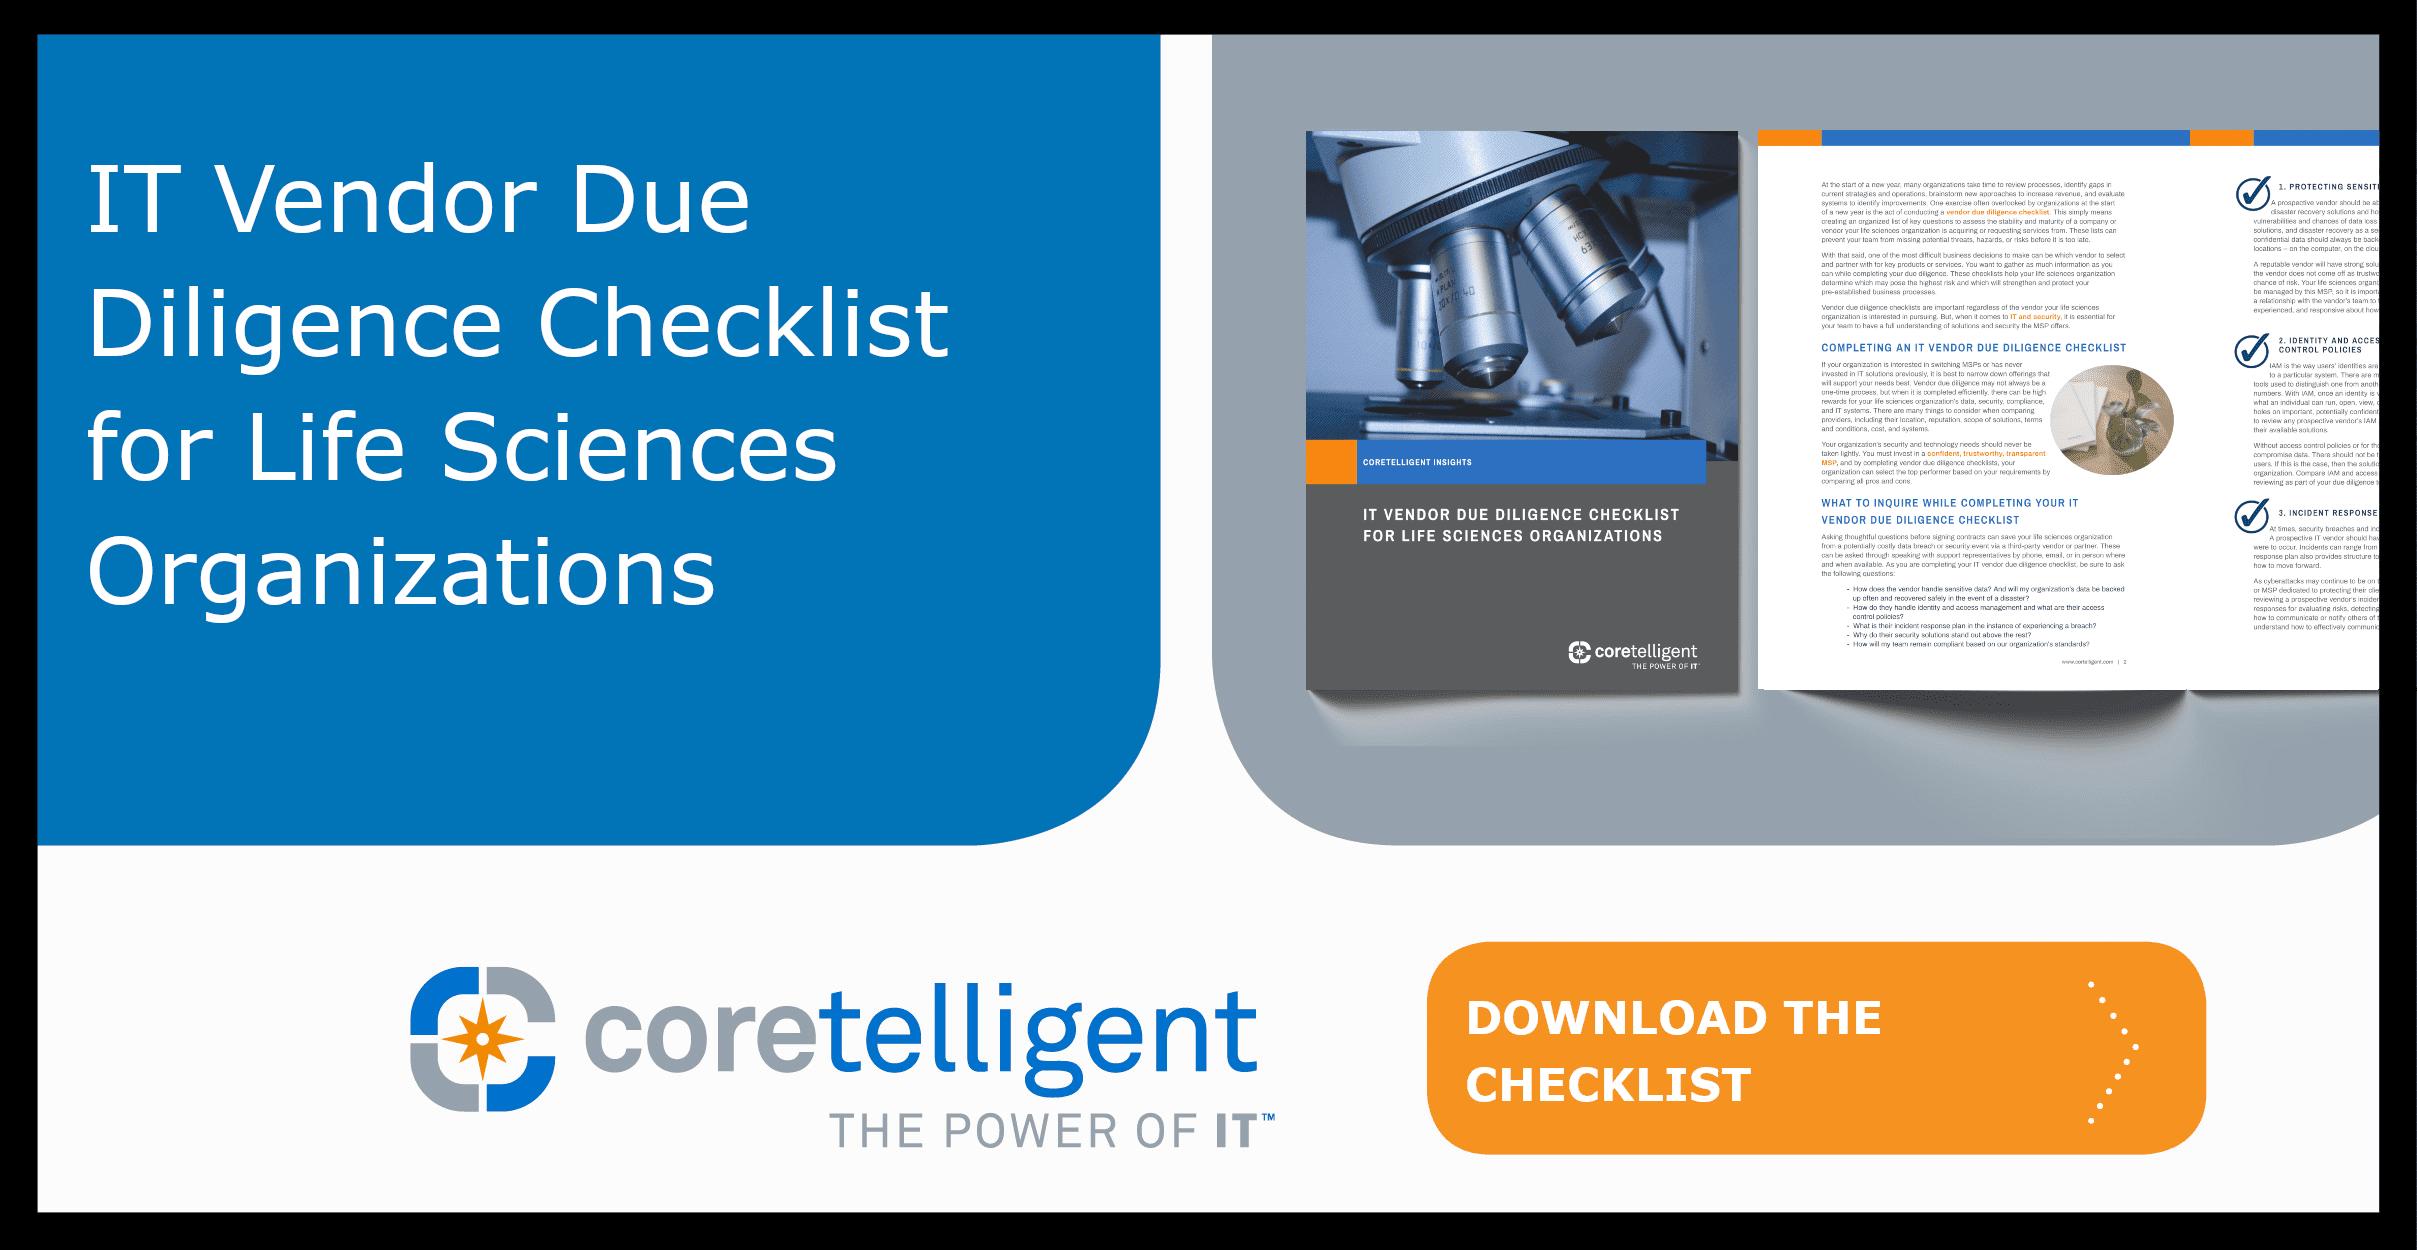 IT Vendor Due Diligence Checklist for Life Sciences Organizations